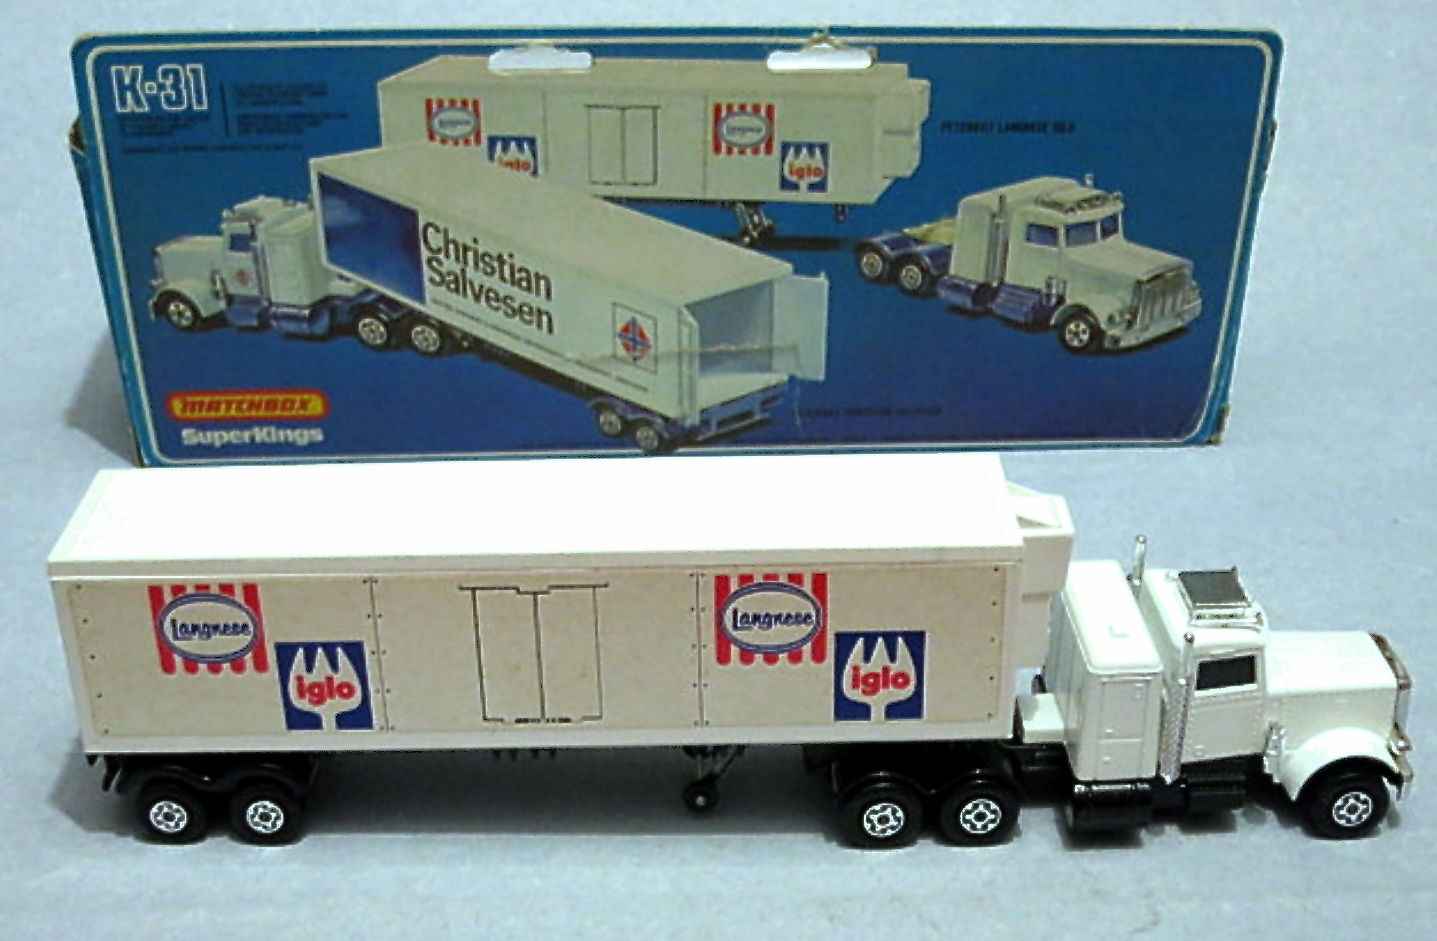 Peterbilt Refrigeration Truck (K-31)